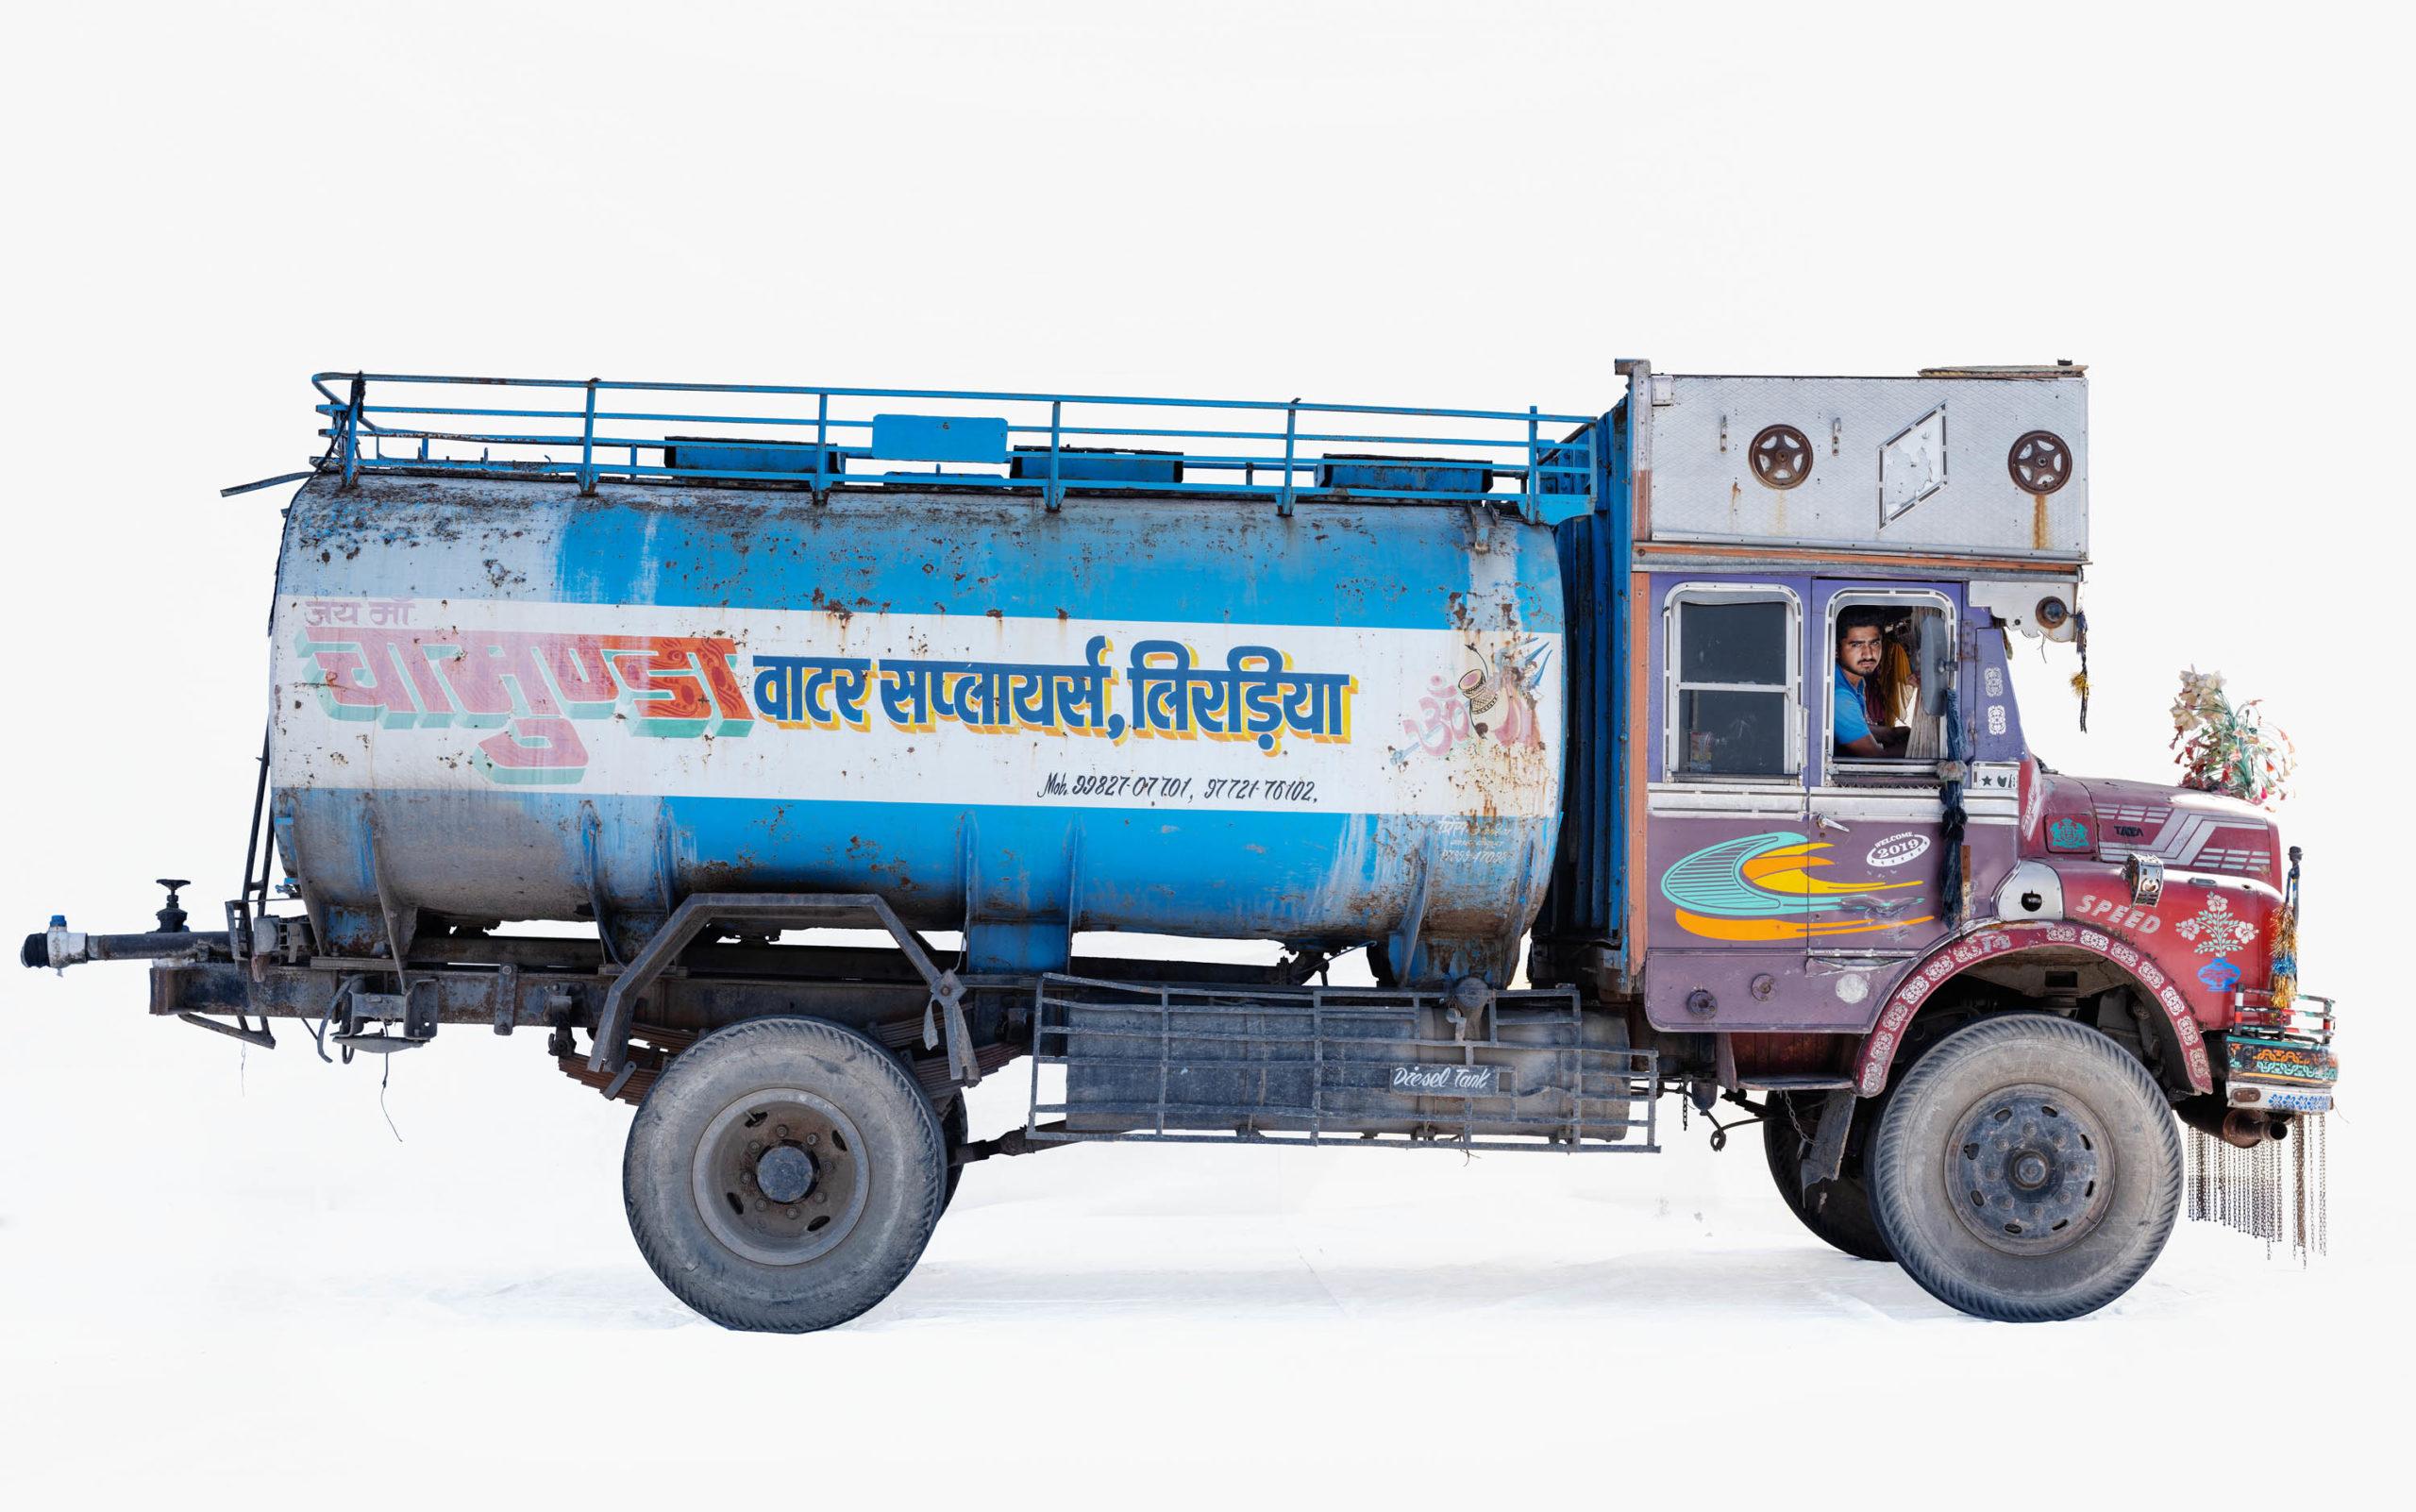 Tata 1612 water tanker; Truck driver Radhesham Jat (Bhilwara, Rajasthan)